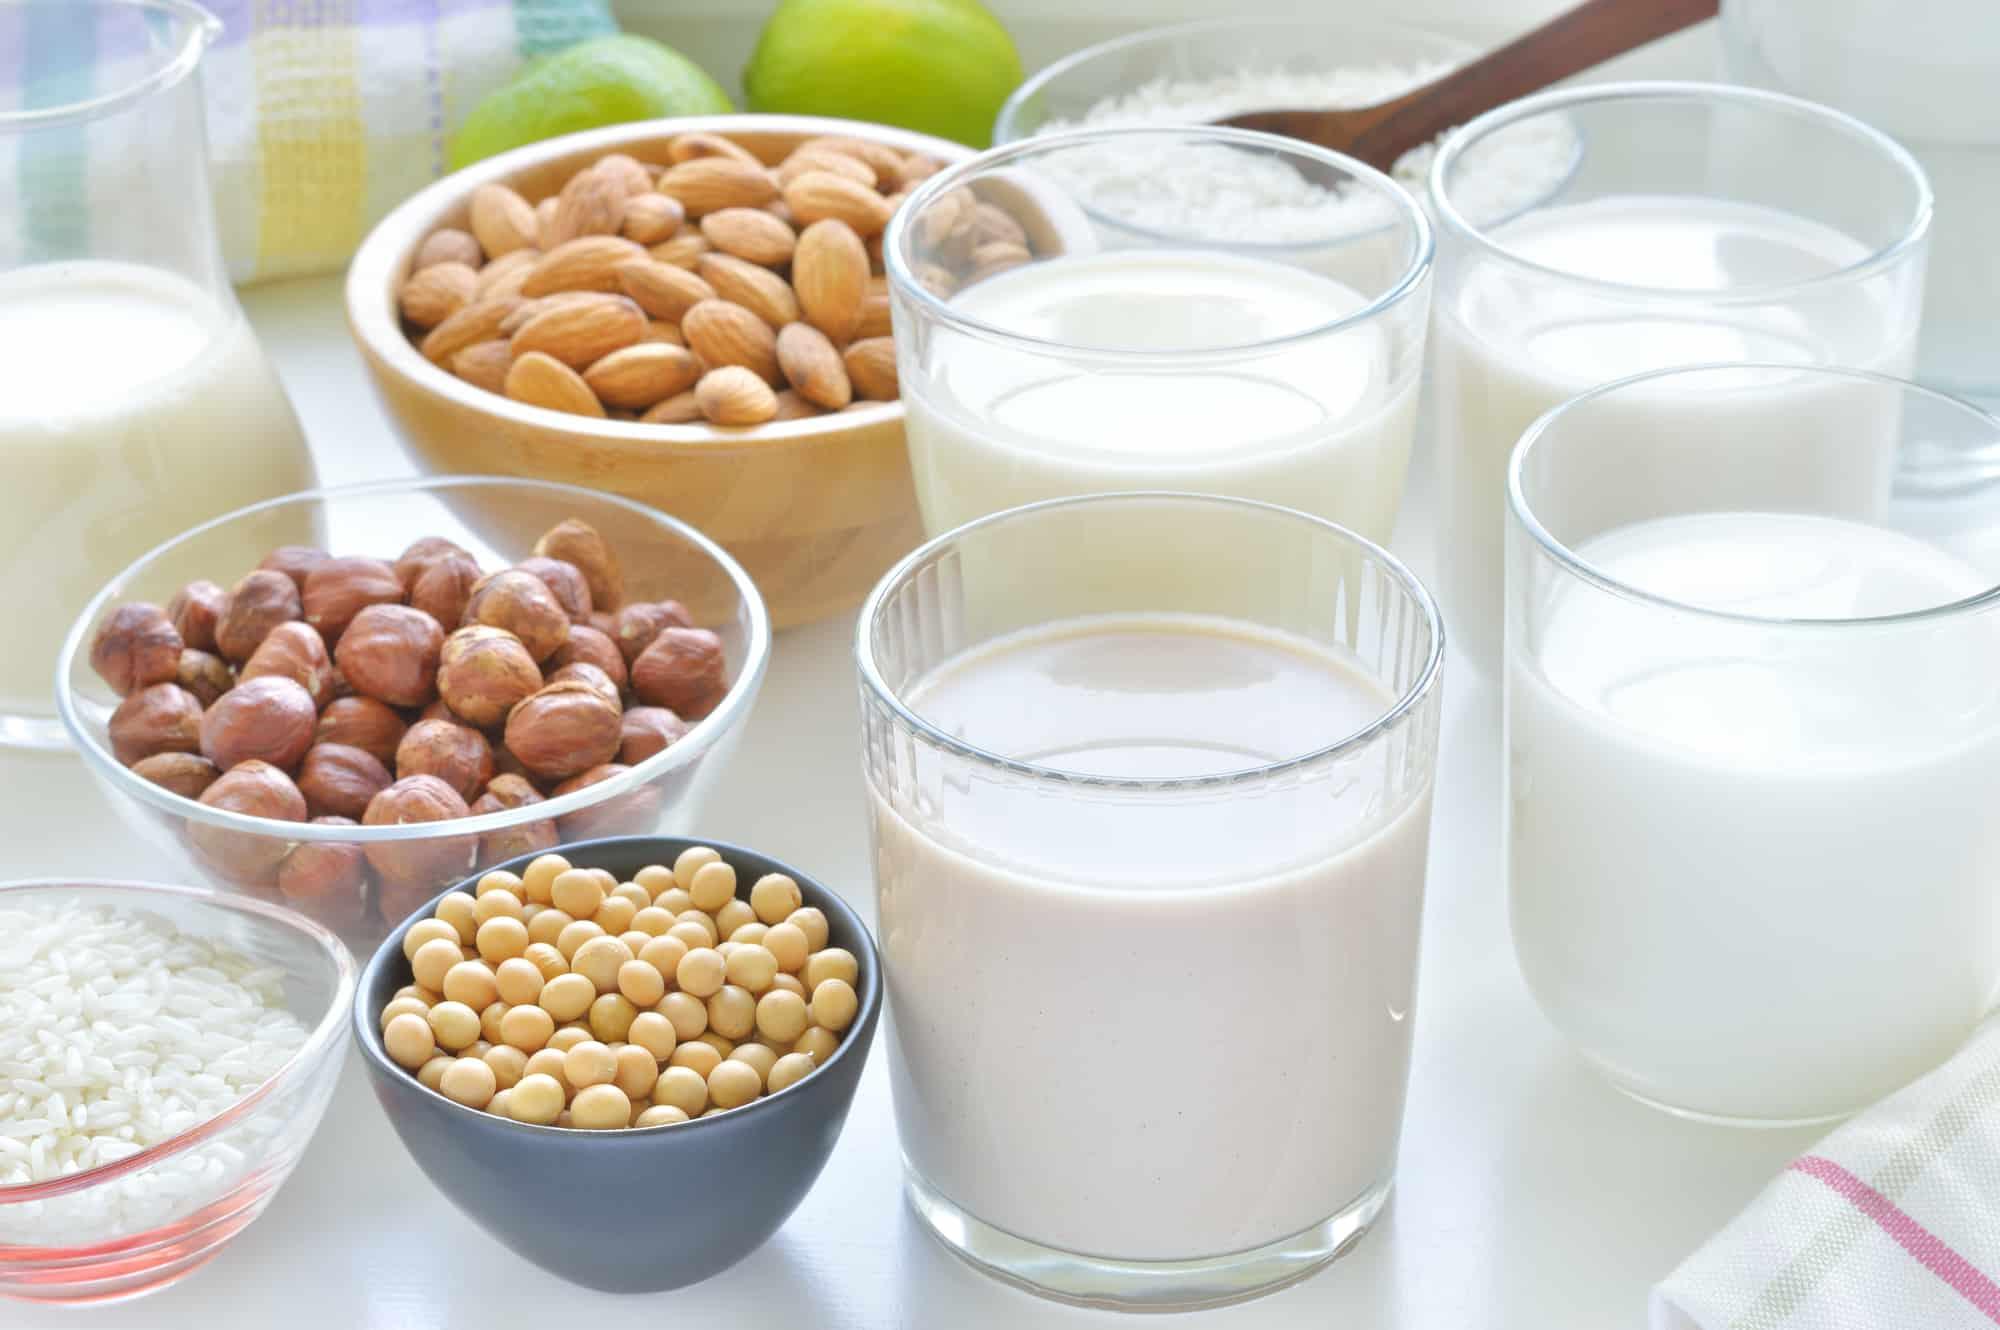 Different vegan milks on a table. Hazelnut, rice, soya and almond milk.